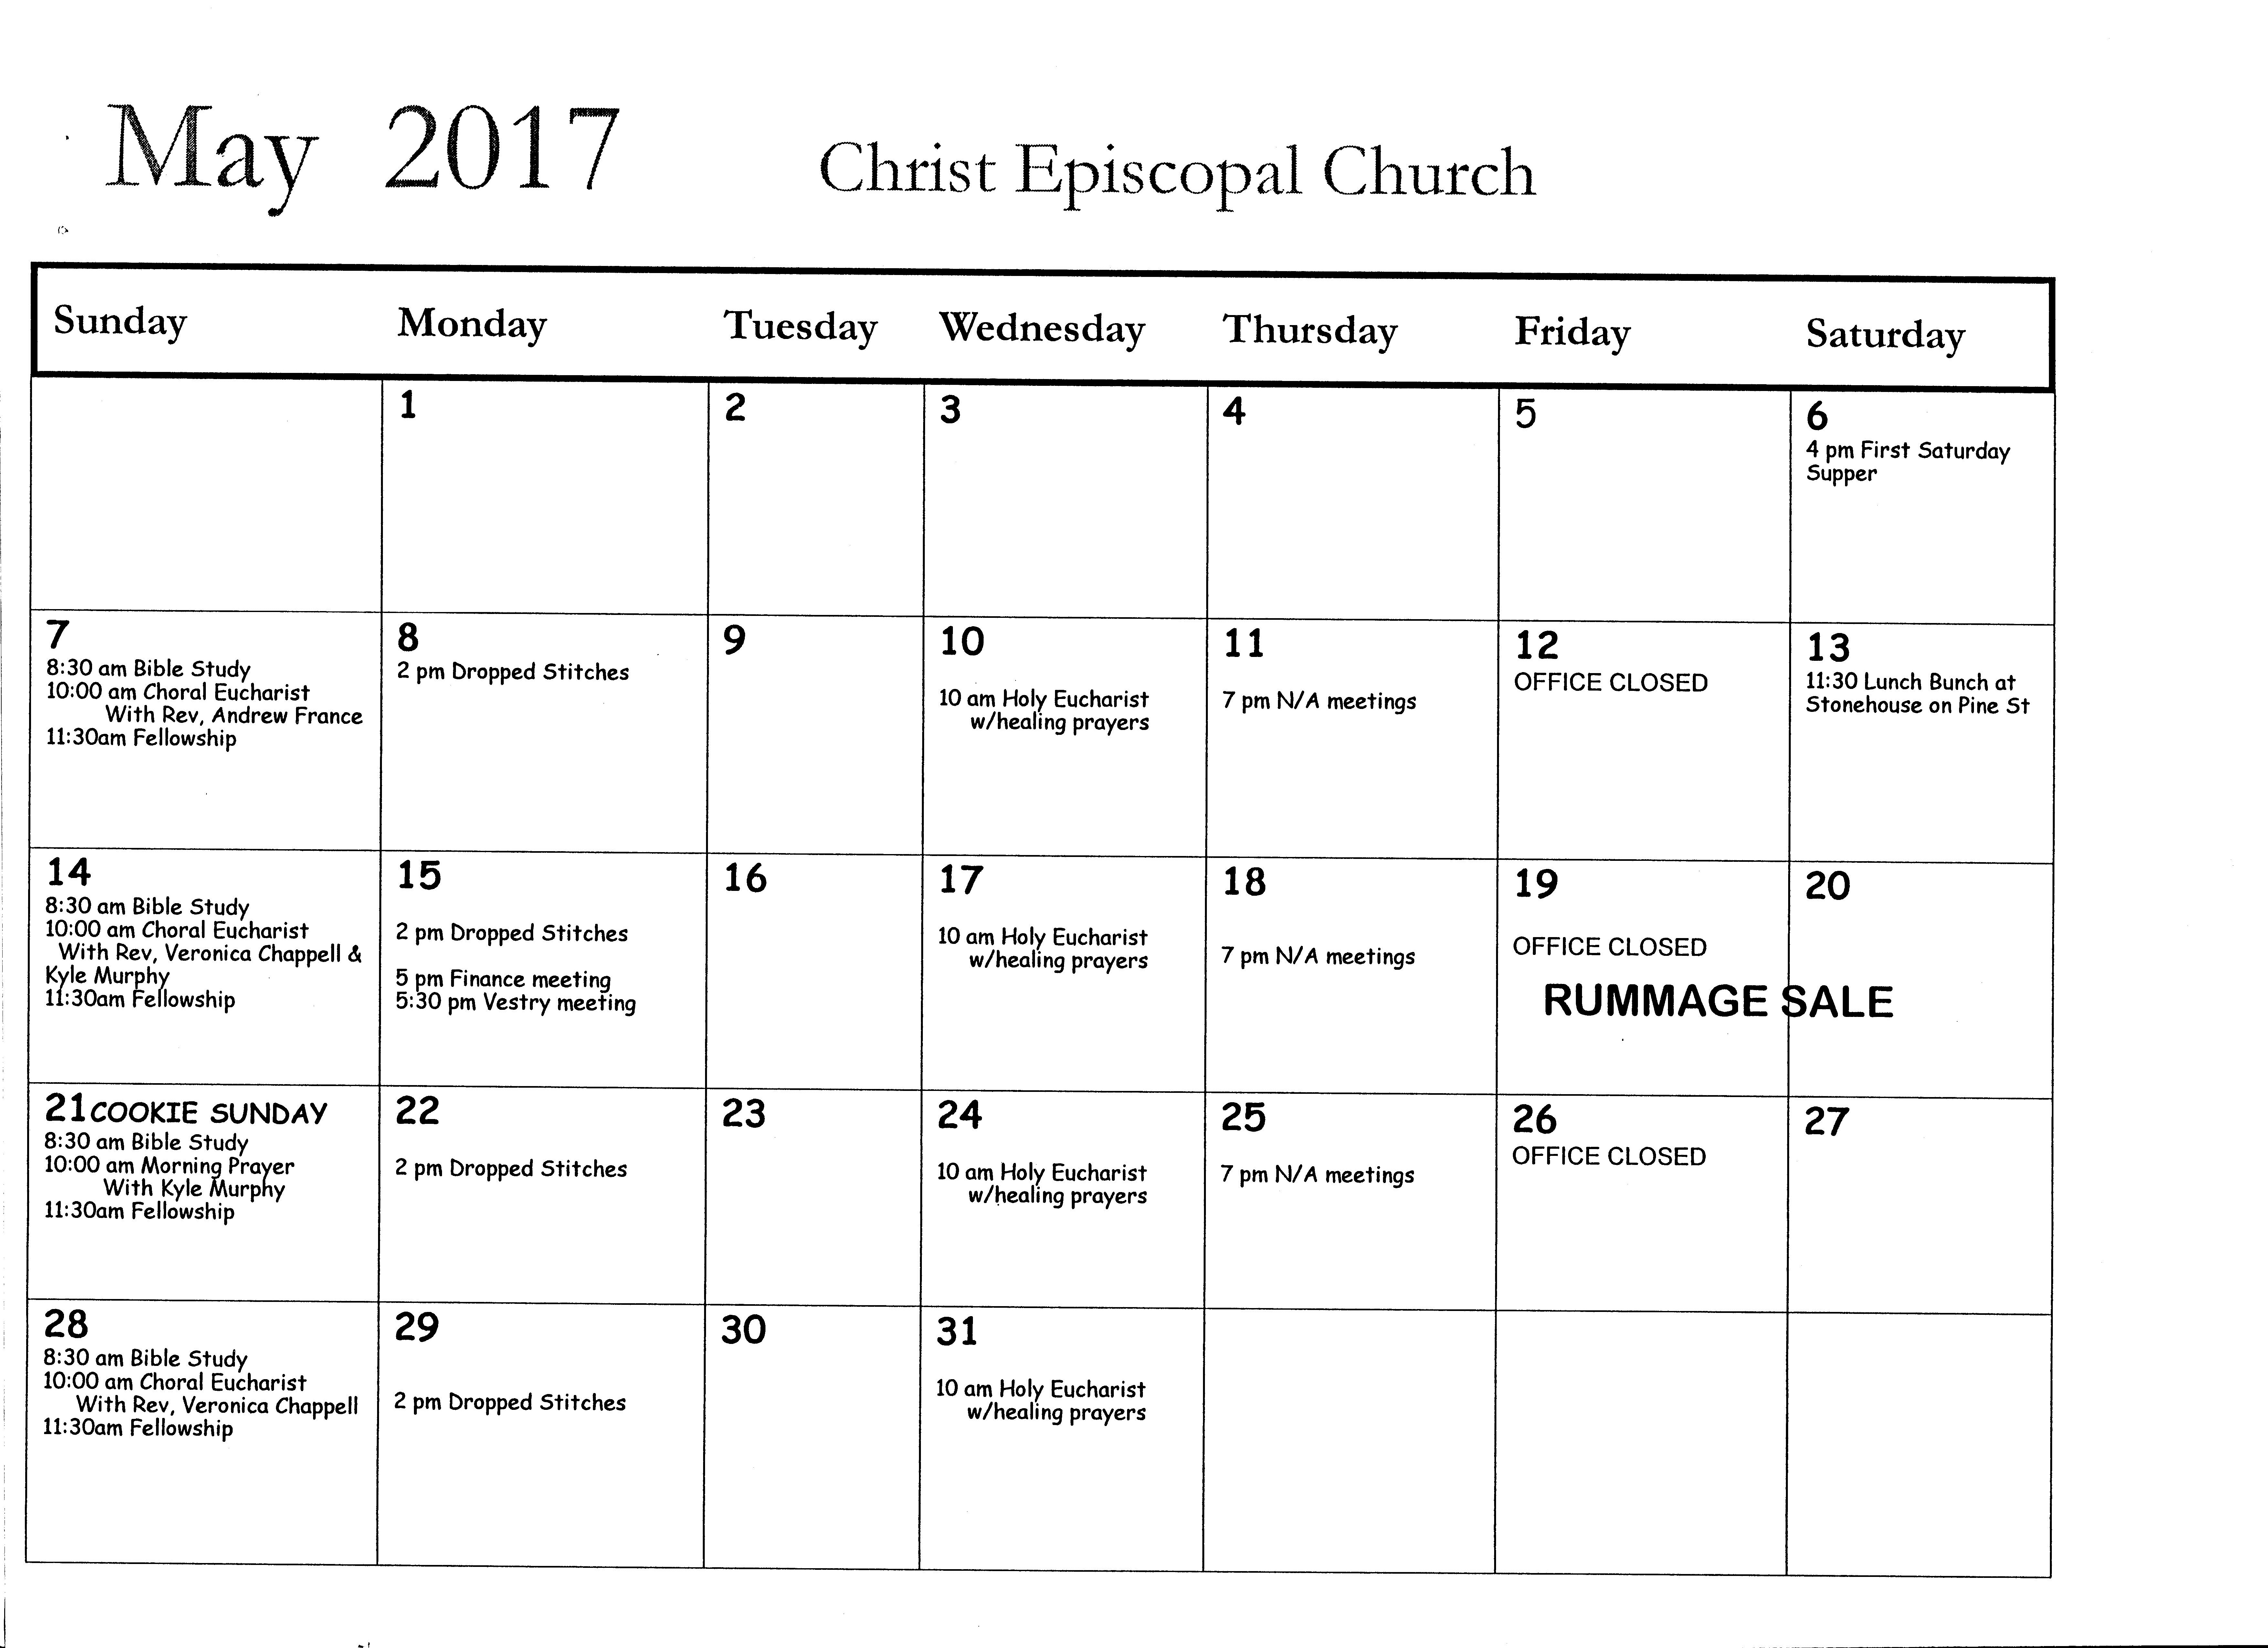 May Calendar Of Events : Calendar of events christ episcopal church